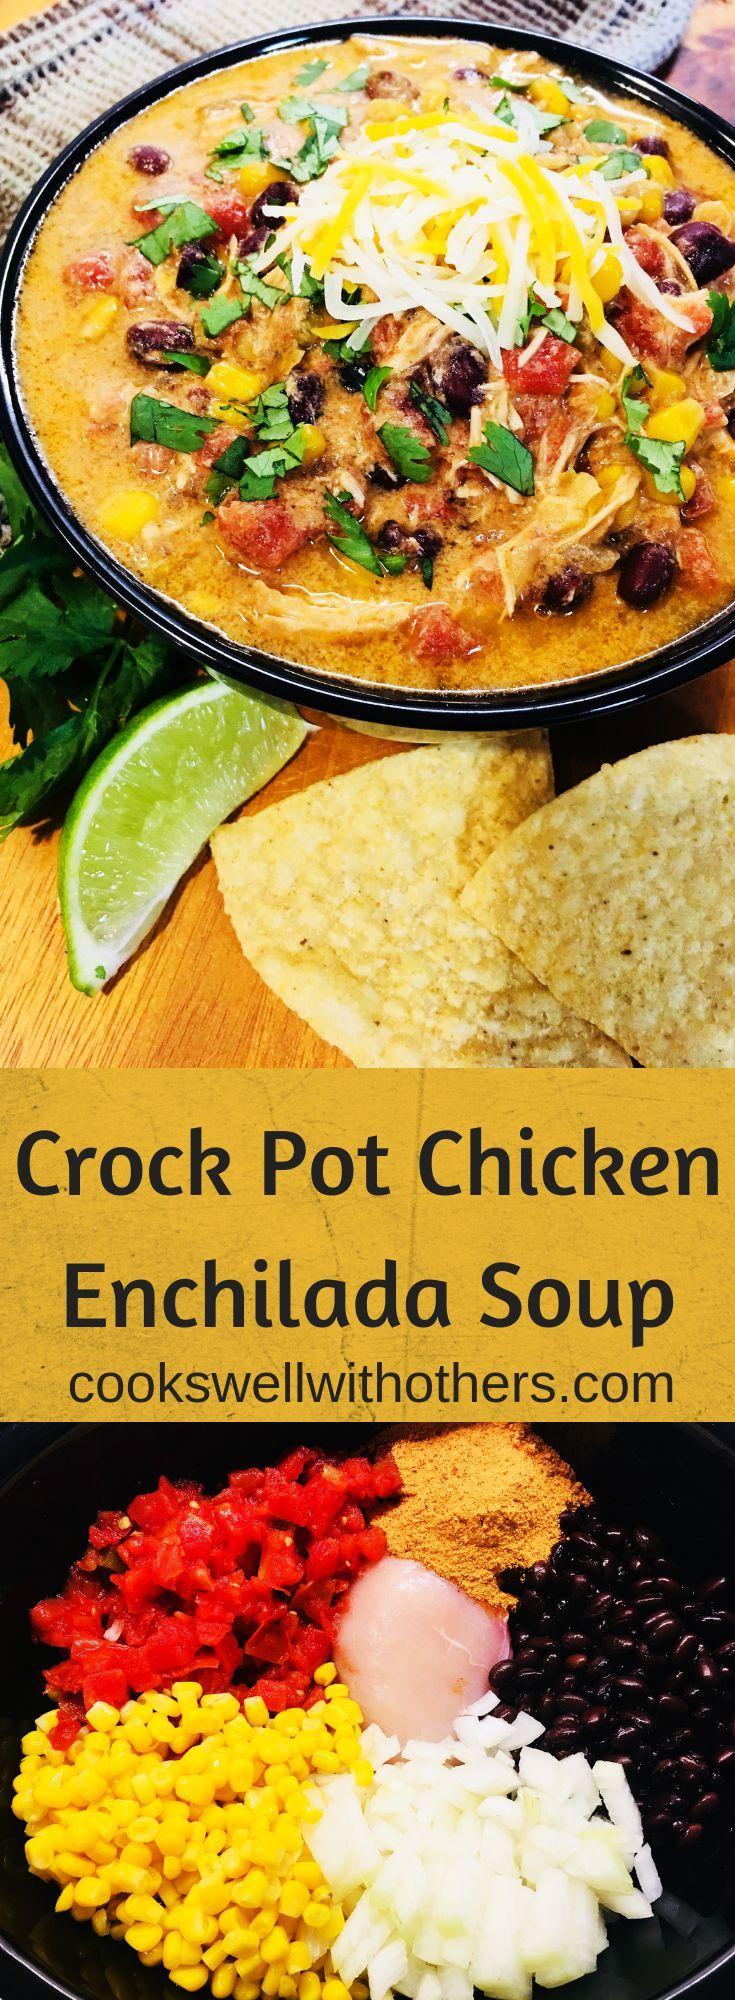 Crock Pot Chicken Enchilada Soup #crockpotmeals